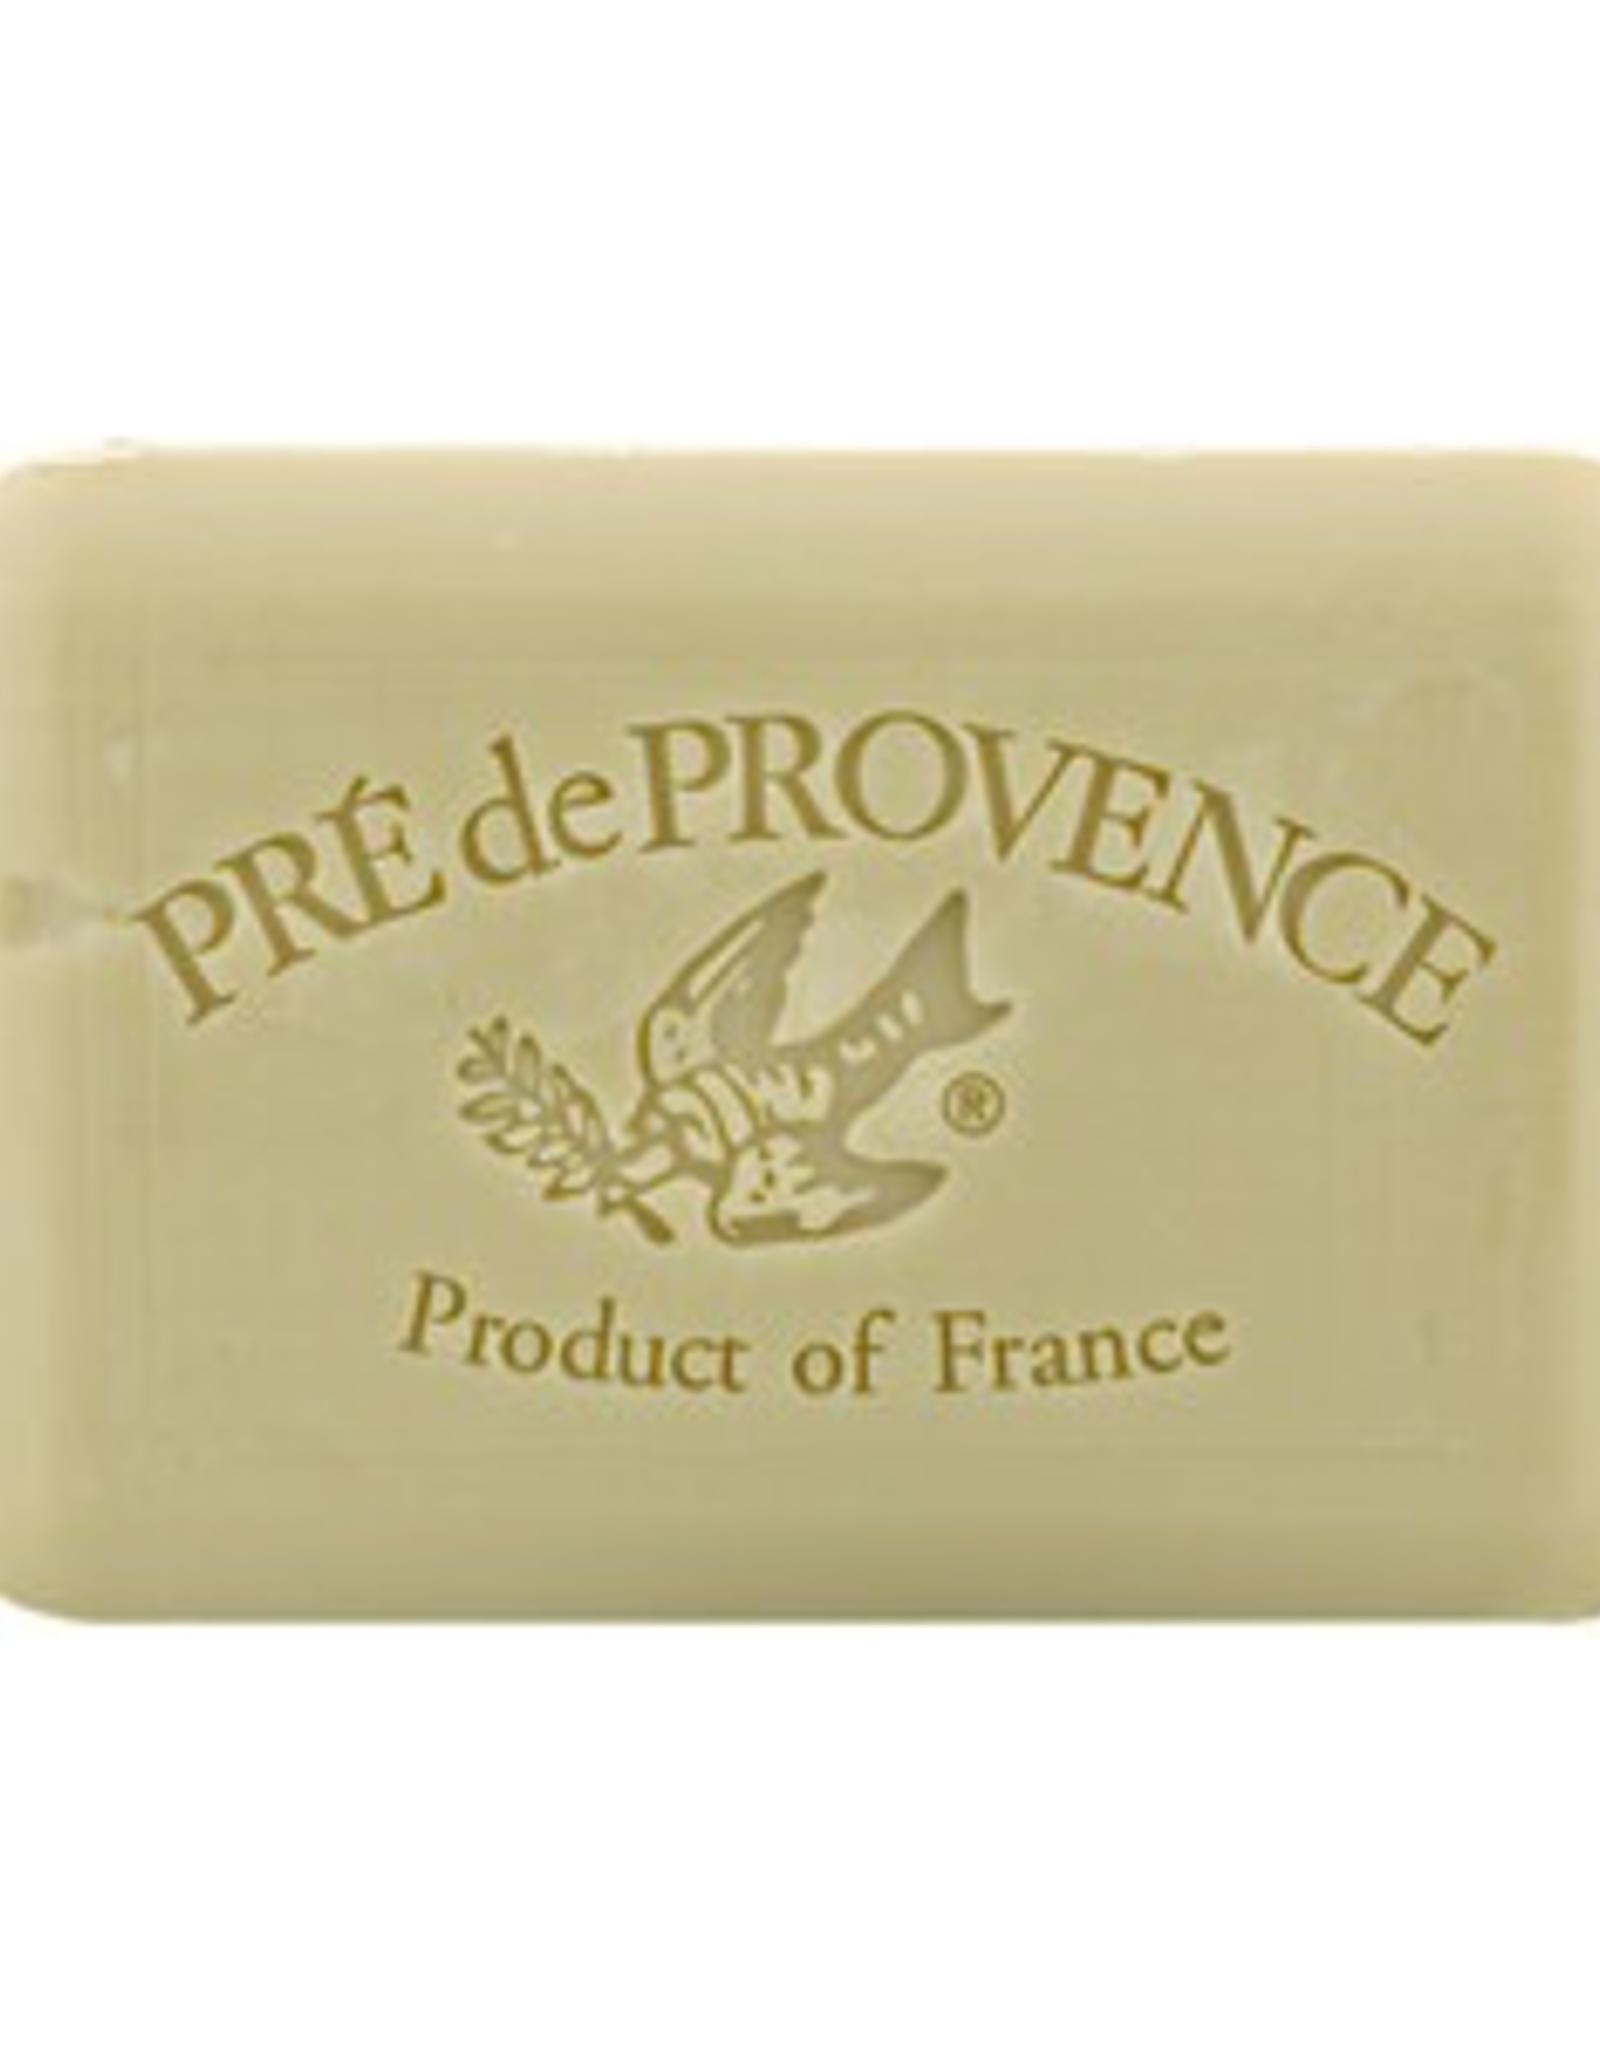 PRE de PROVENCE Verbena Soap, 150g